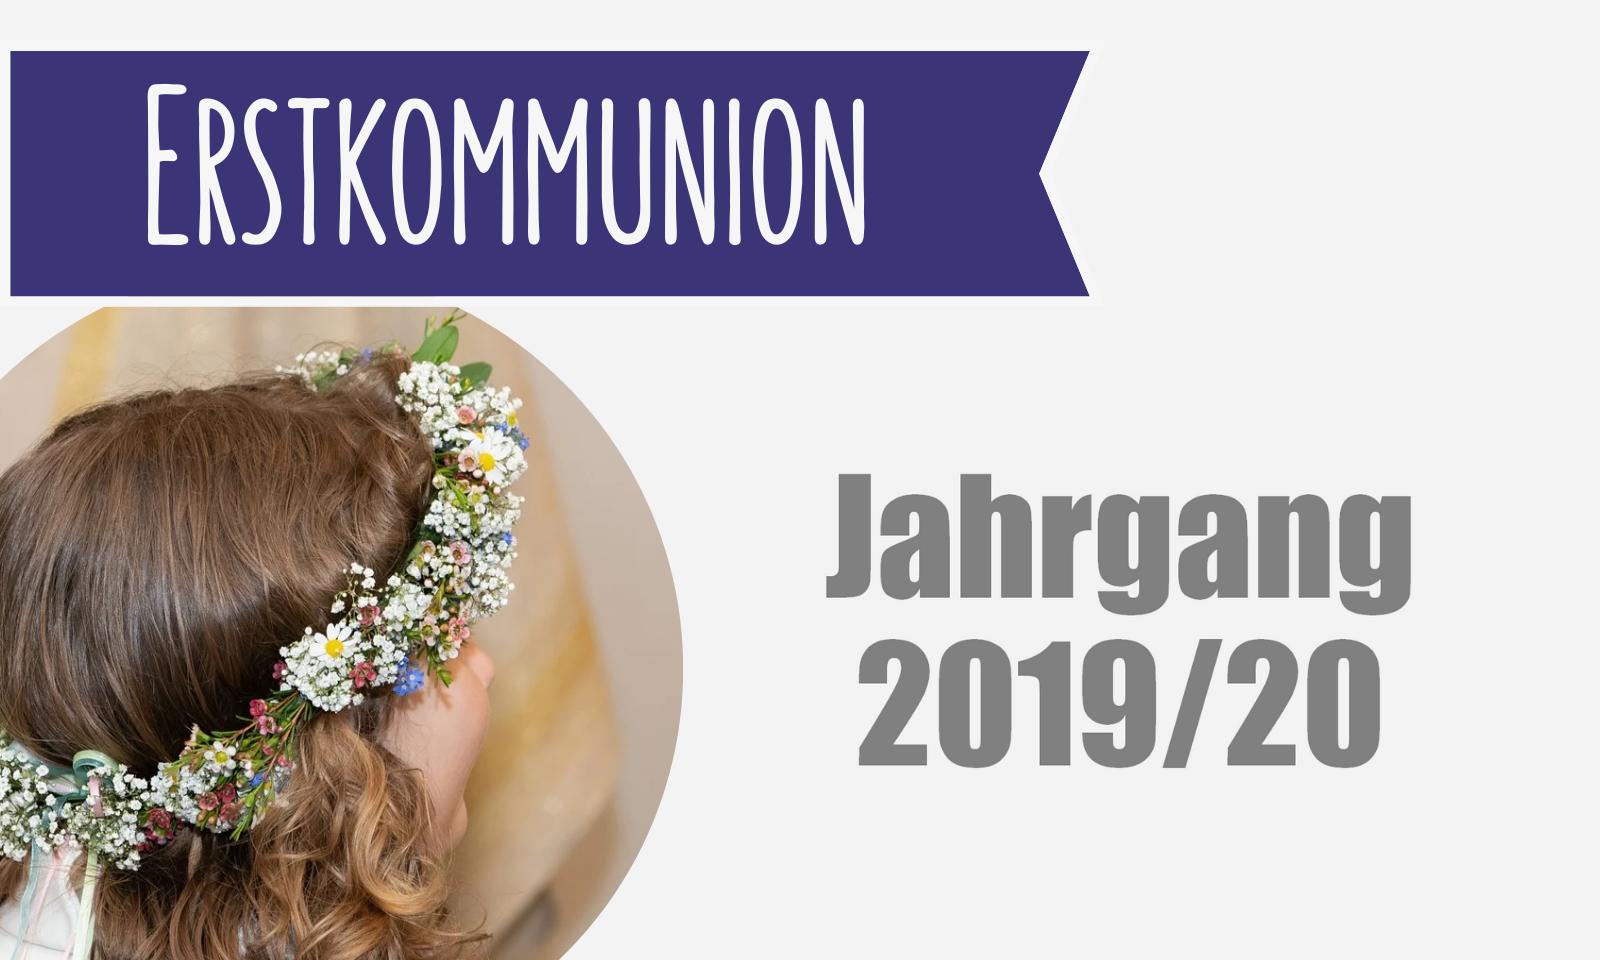 Erstkommunion Symbolbild2019 20